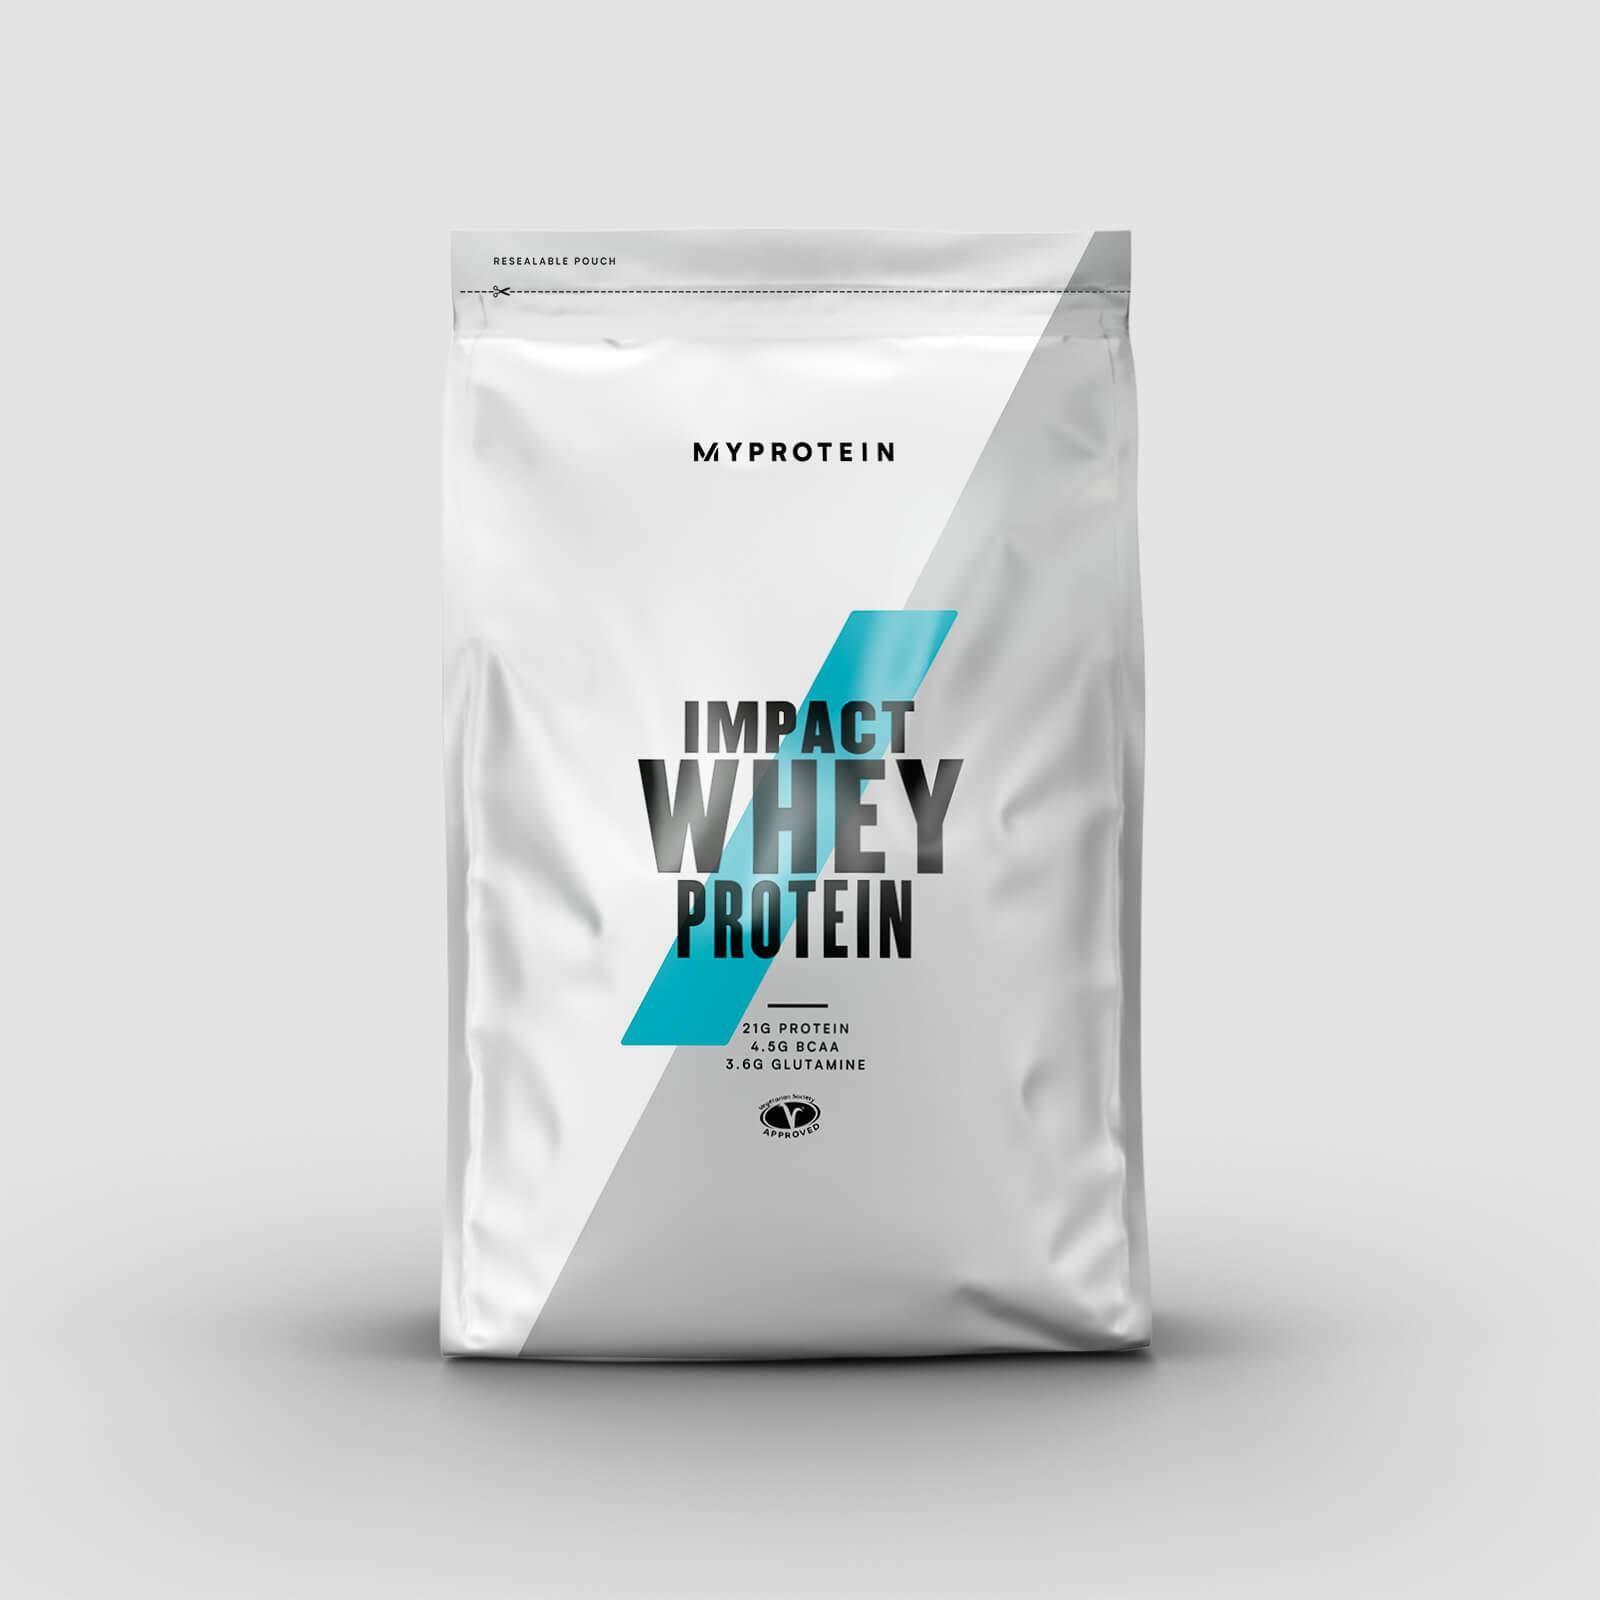 Myprotein Impact Whey Protein - 5kg - Gateau au fromage Myrtille